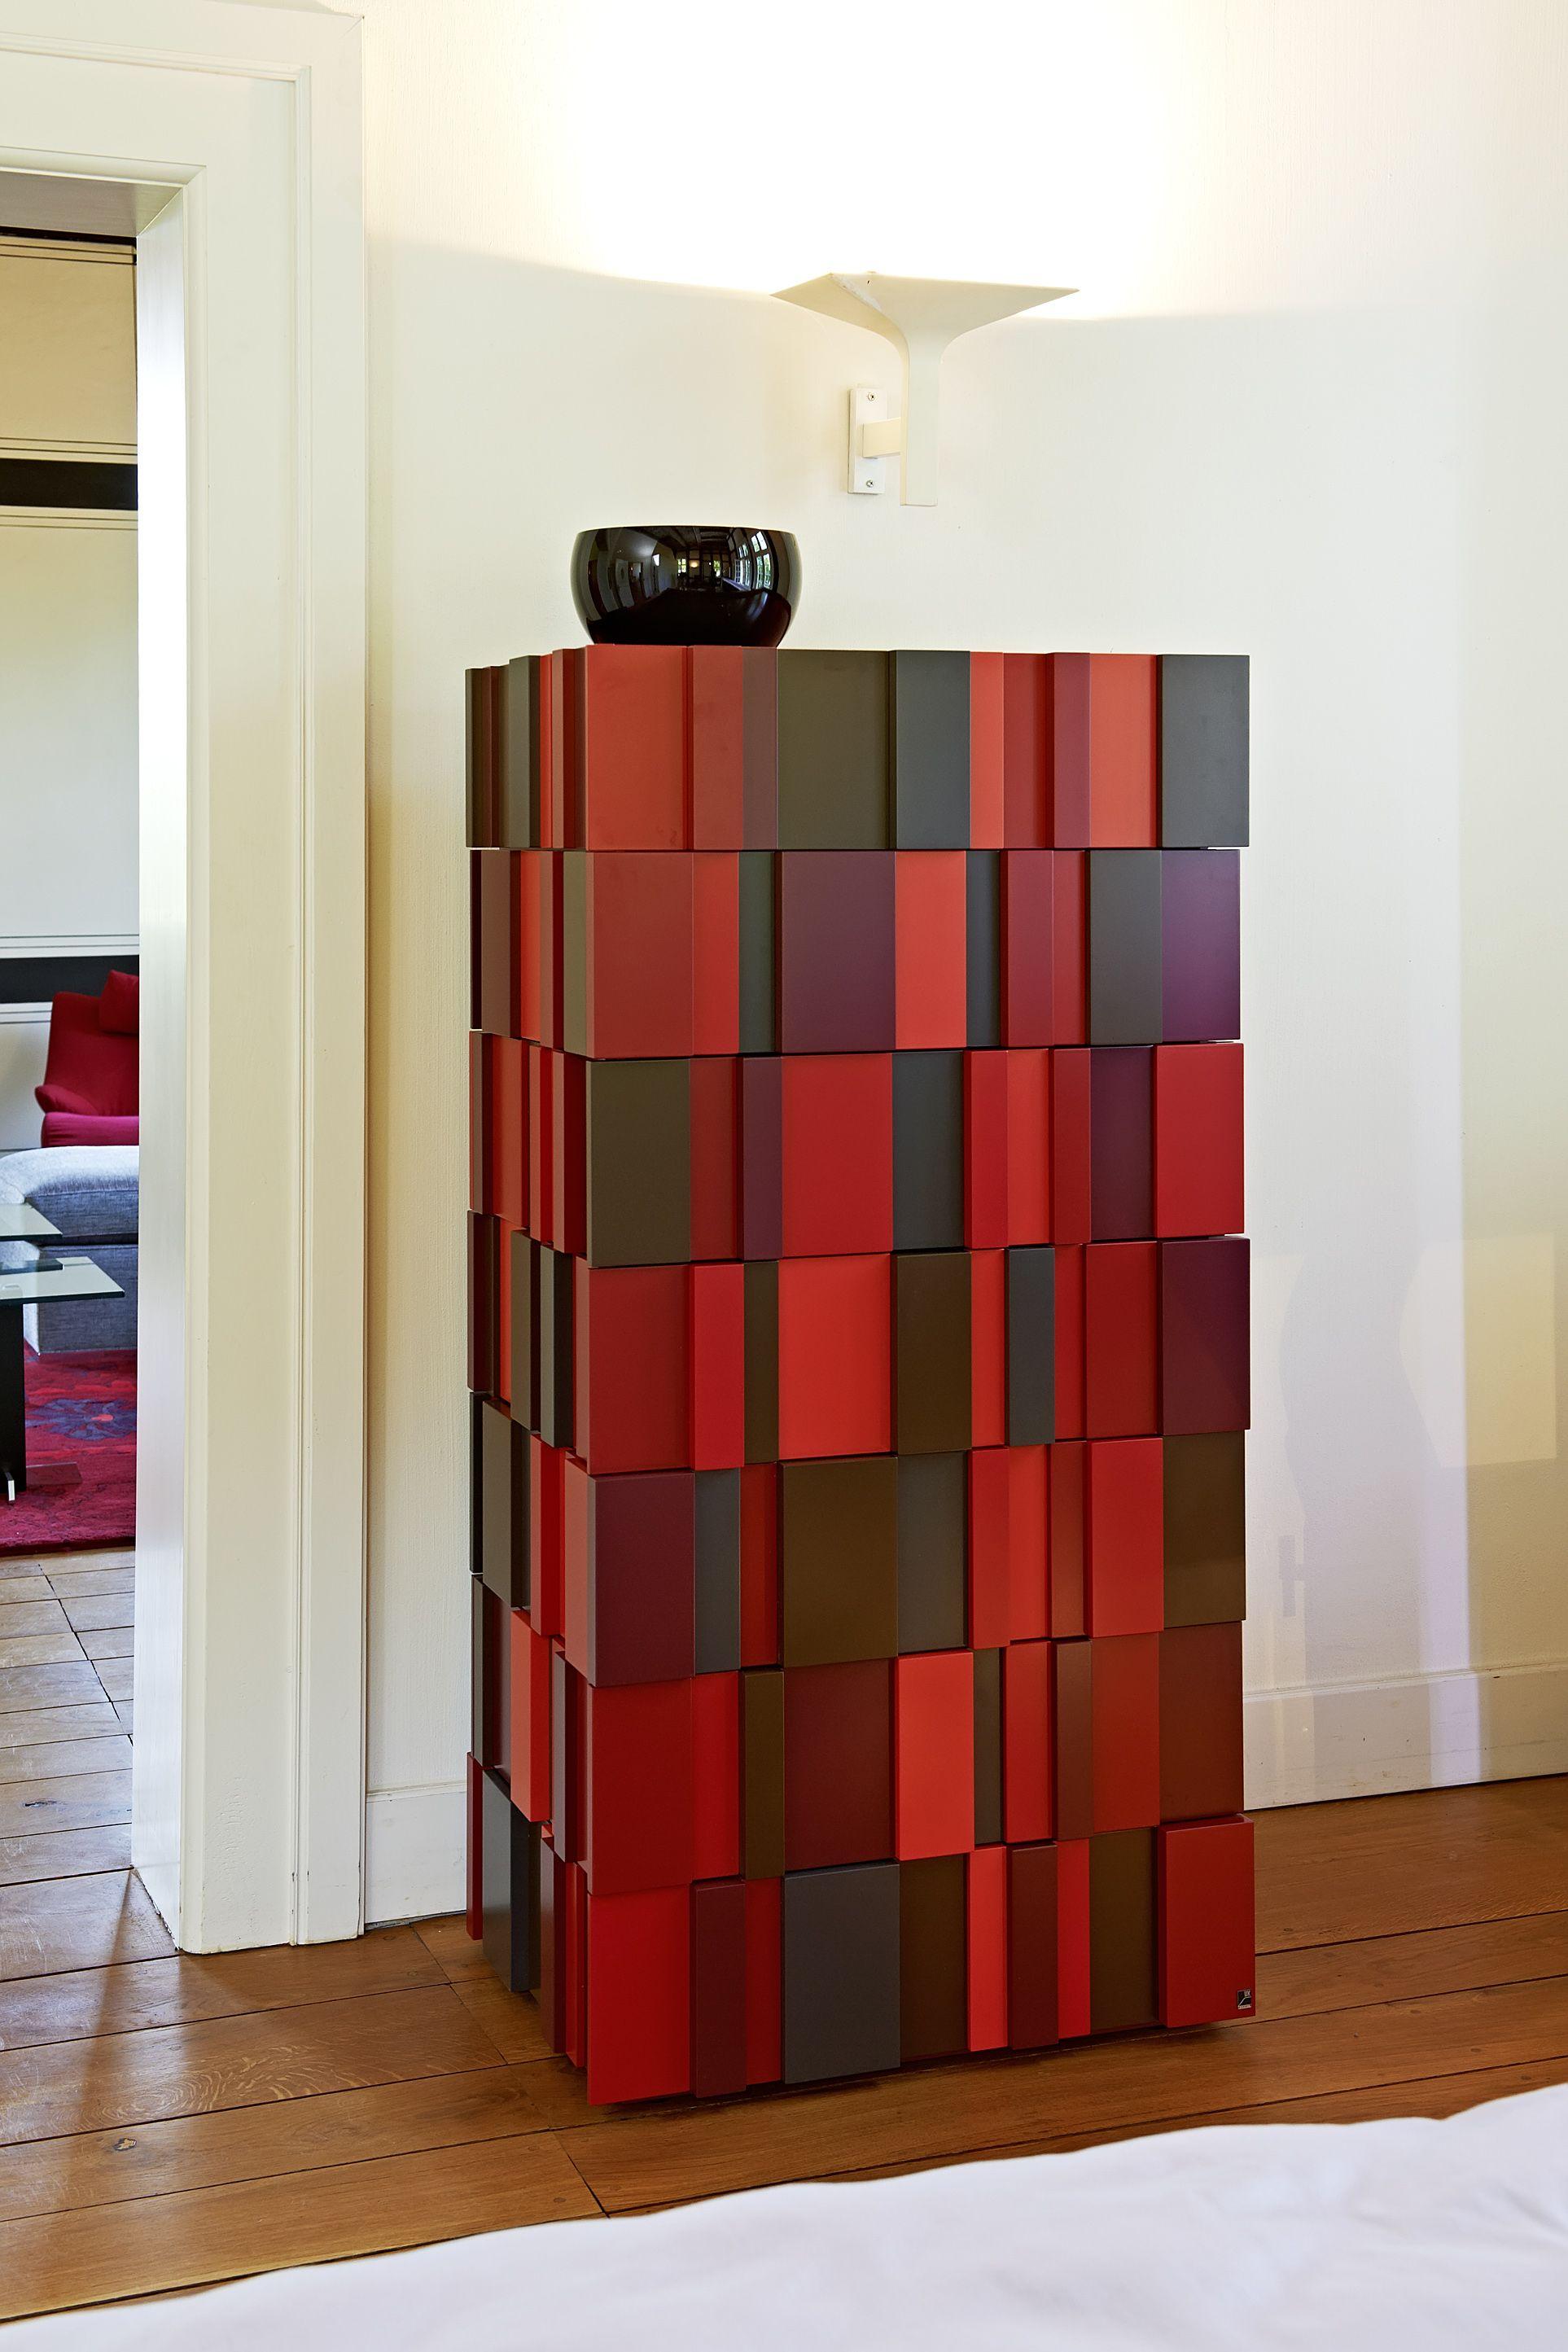 Rote Schrank In Kunstvollem Design Wallachmoebelhaus Wallach